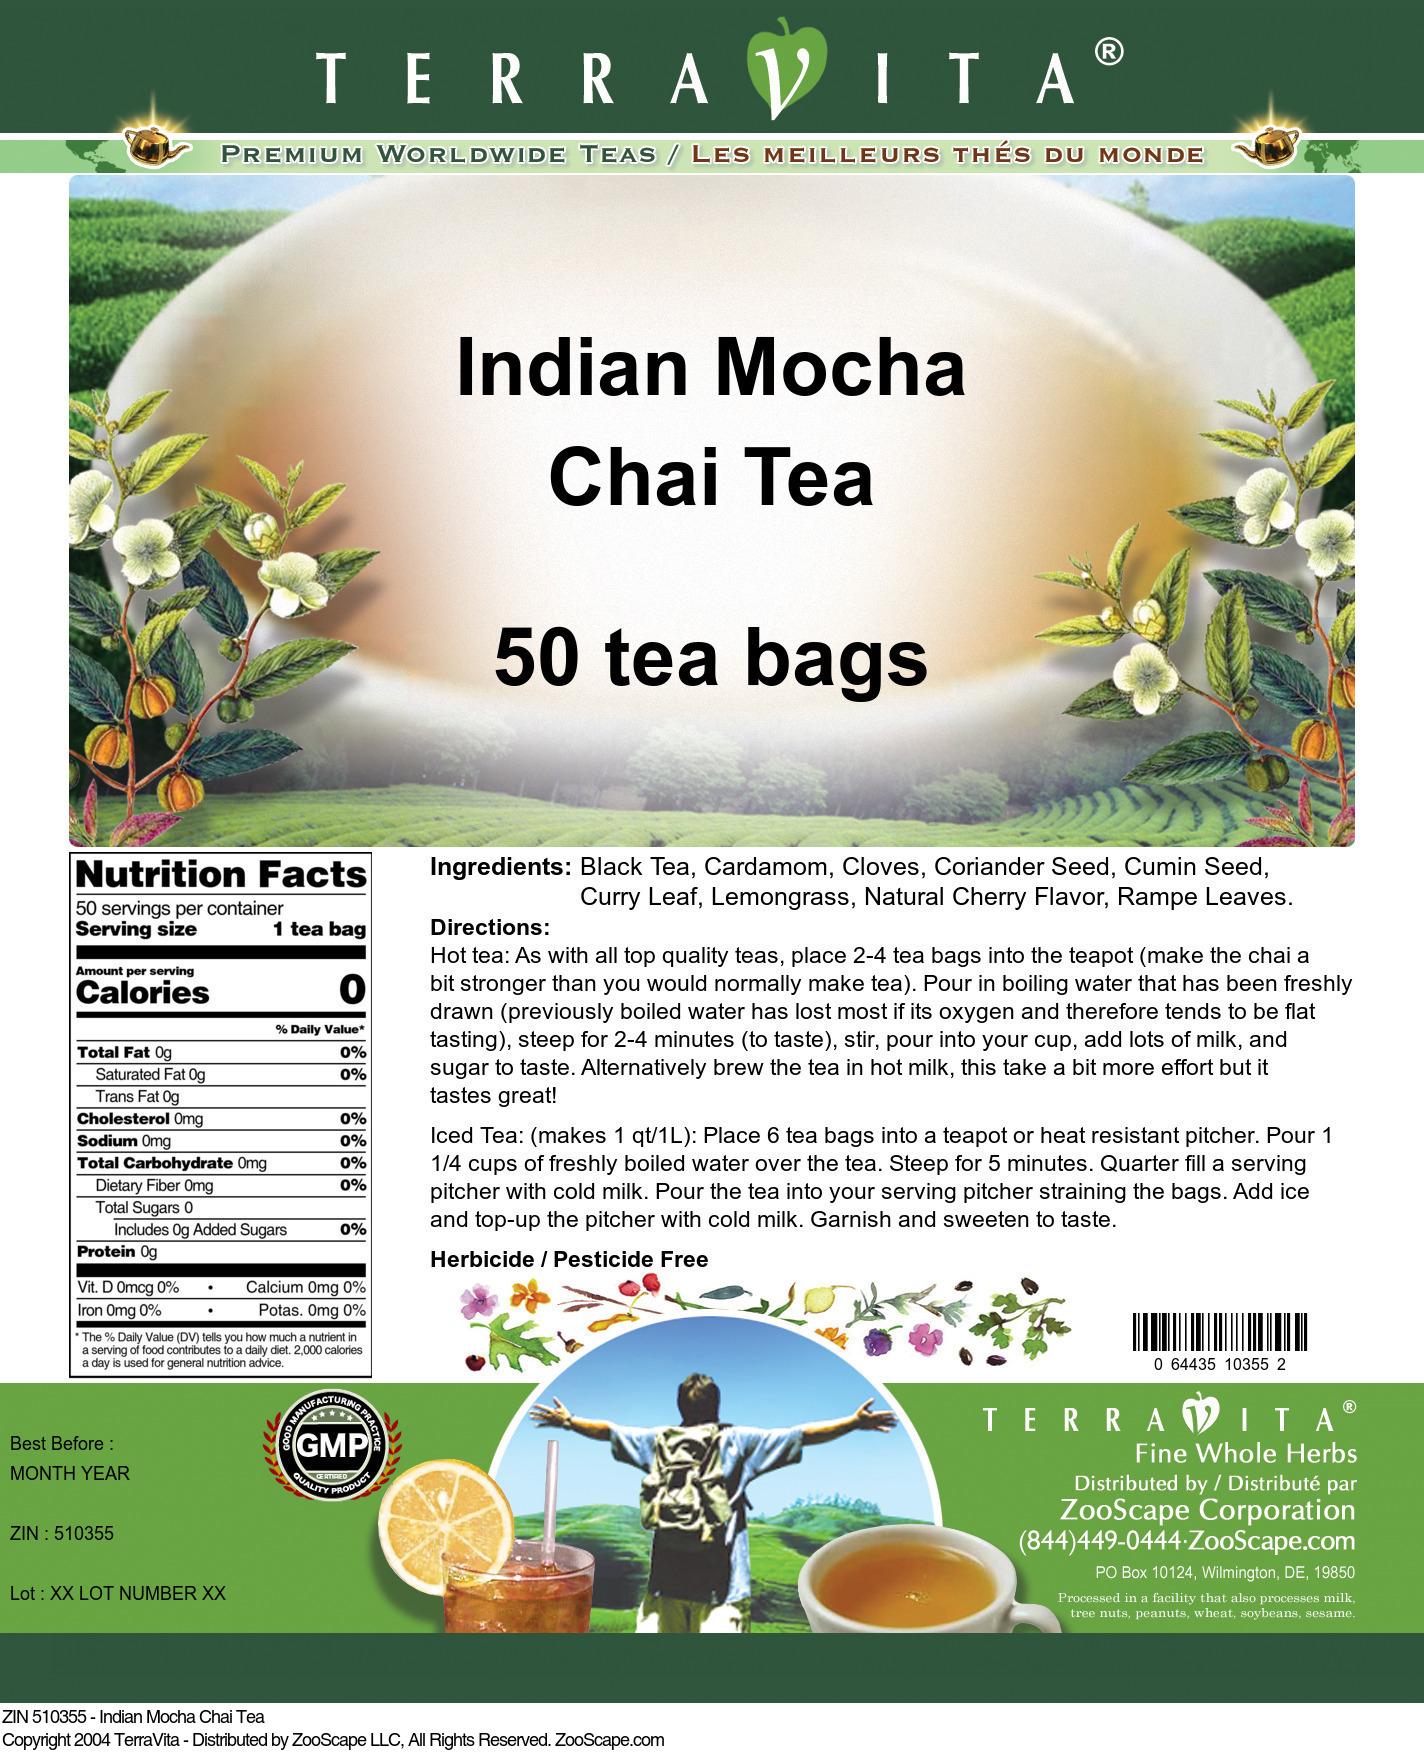 Indian Mocha Chai Tea